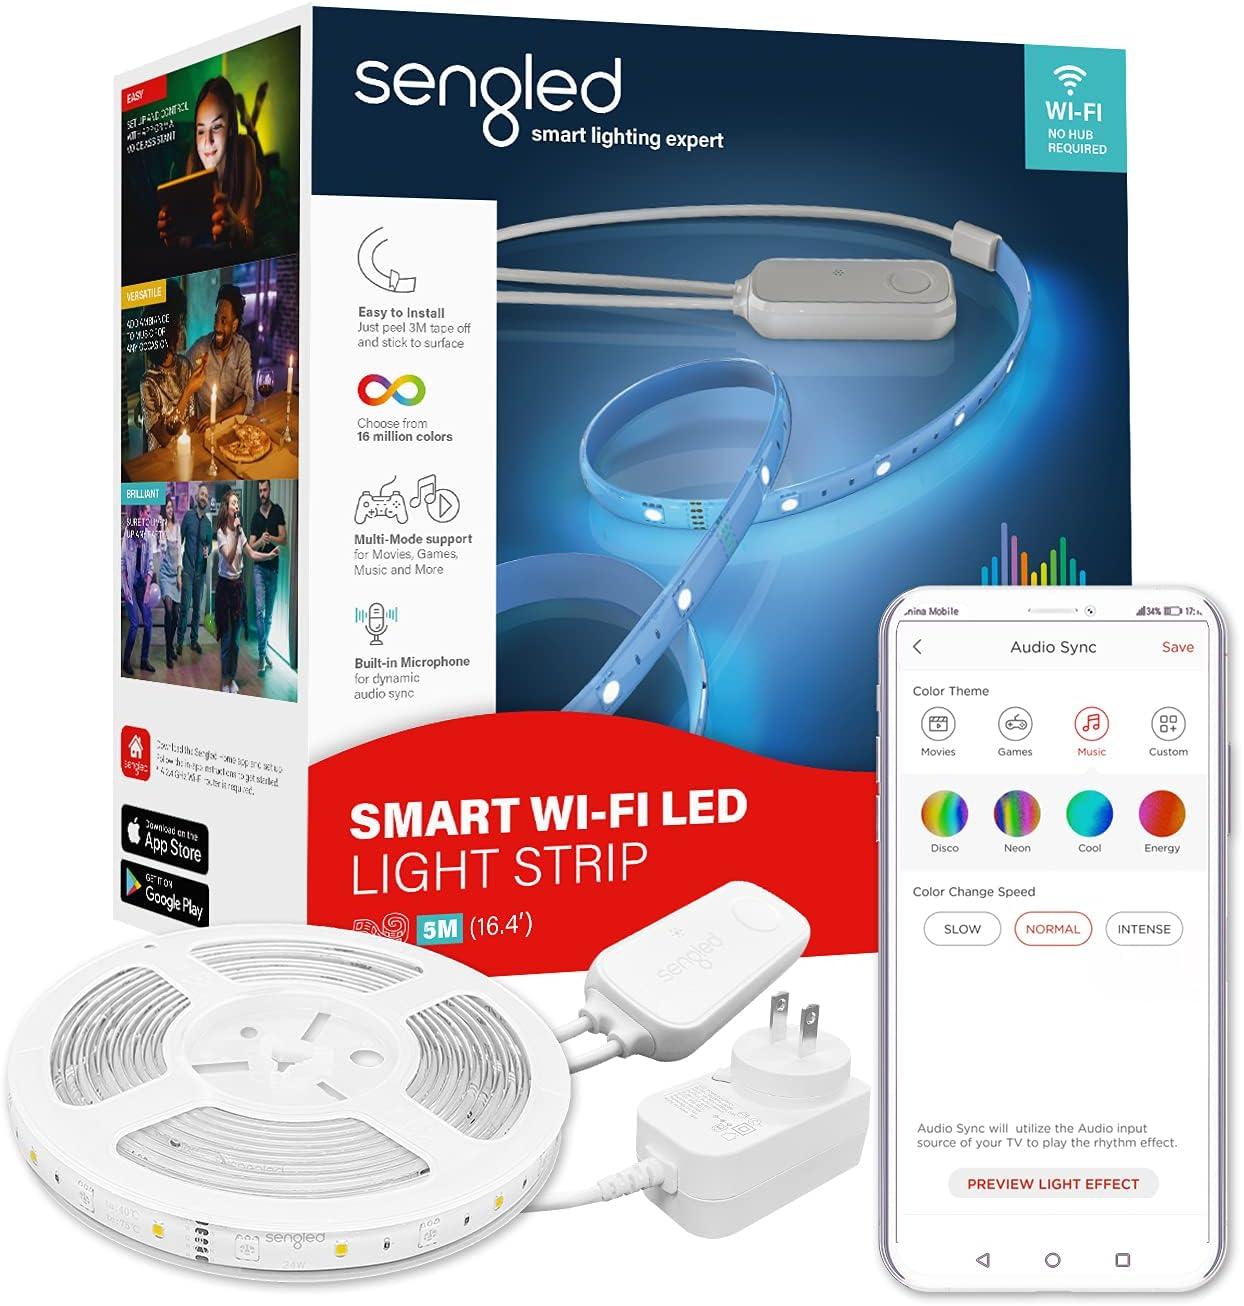 Sengled Smart LED Strip Lights, 16.4ft WiFi LED Lights Work with Alexa Google Home, Color Changing Smart Light Strip with APP and Voice Control, Alexa Lights for Bedroom Decor, Music Sync RGB Lights